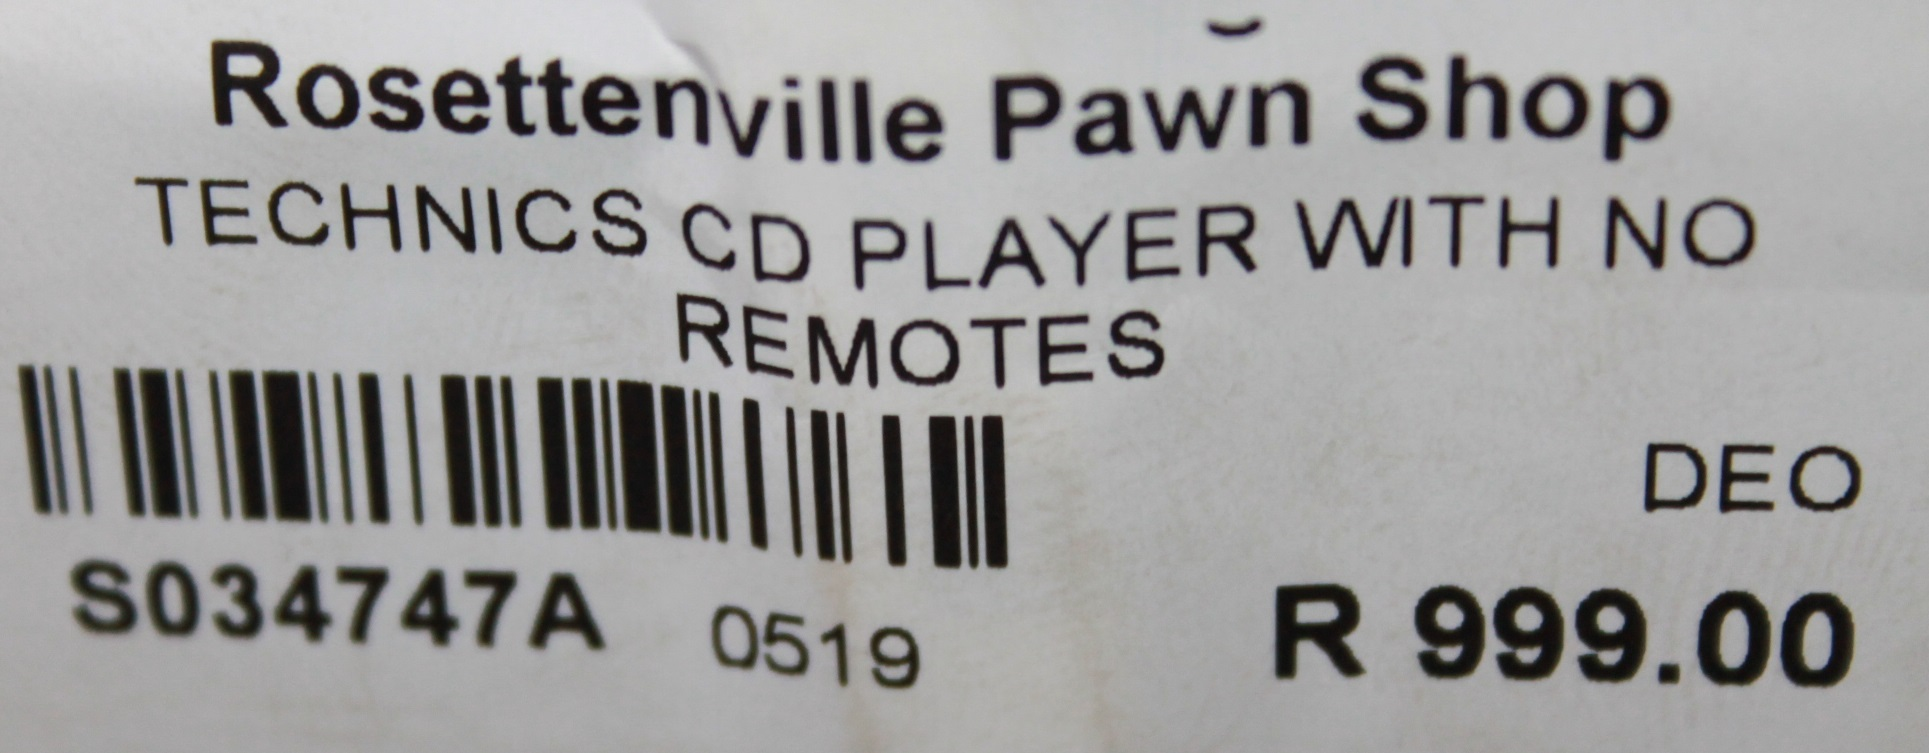 S034747A Technics cd player with no remote #Rosettenvillepawnshop